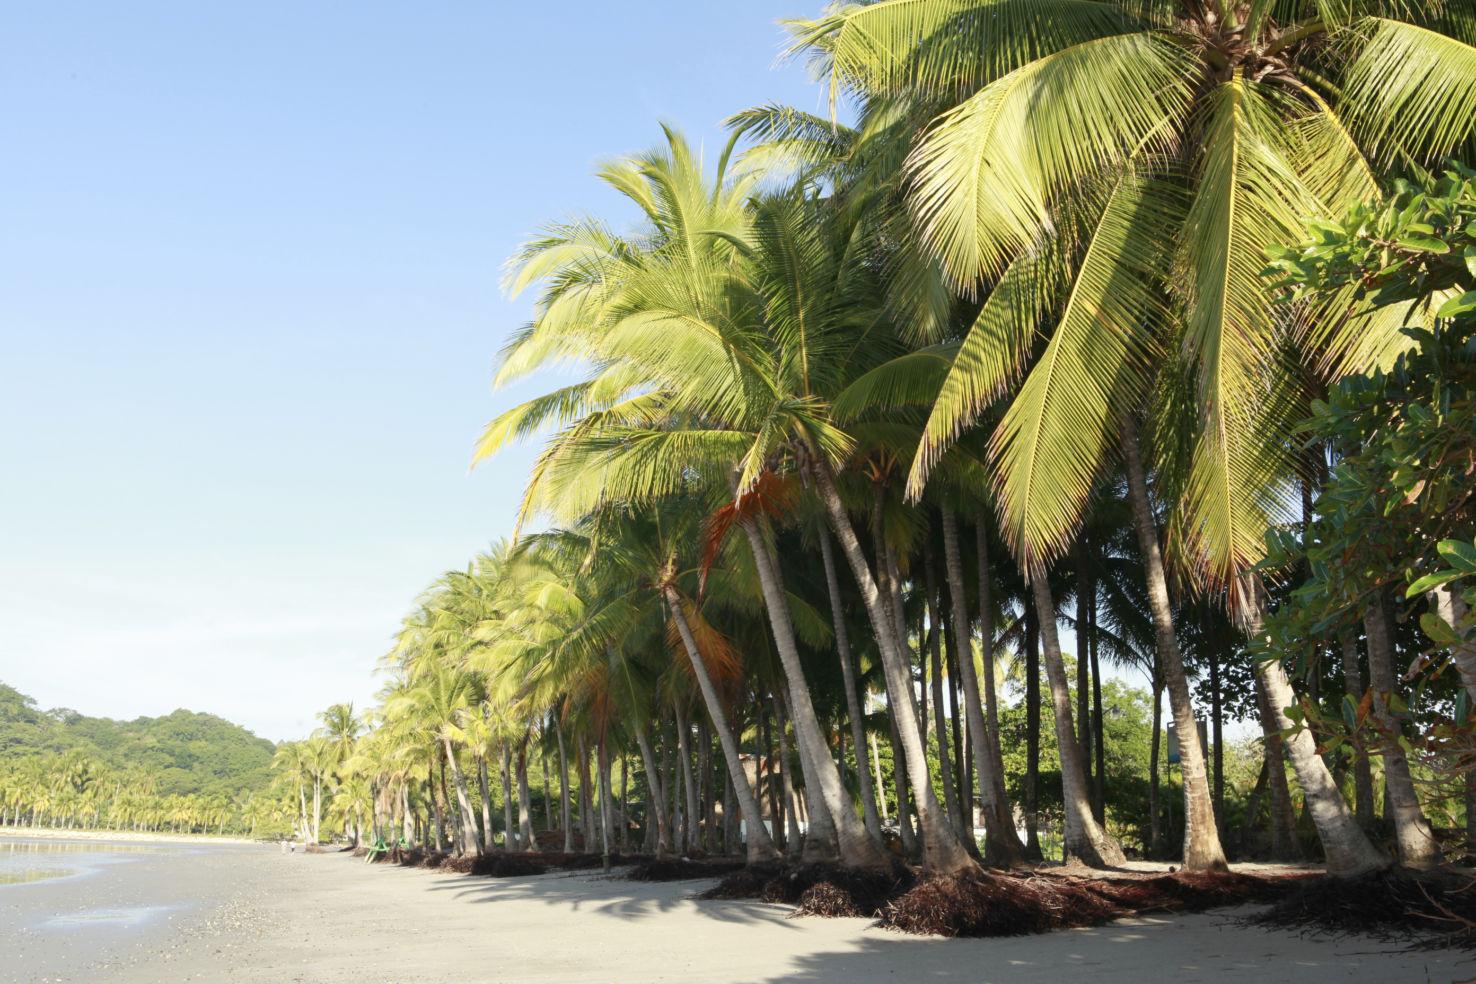 Costa-Rica_Whitney-Tressel_Playa-Samara